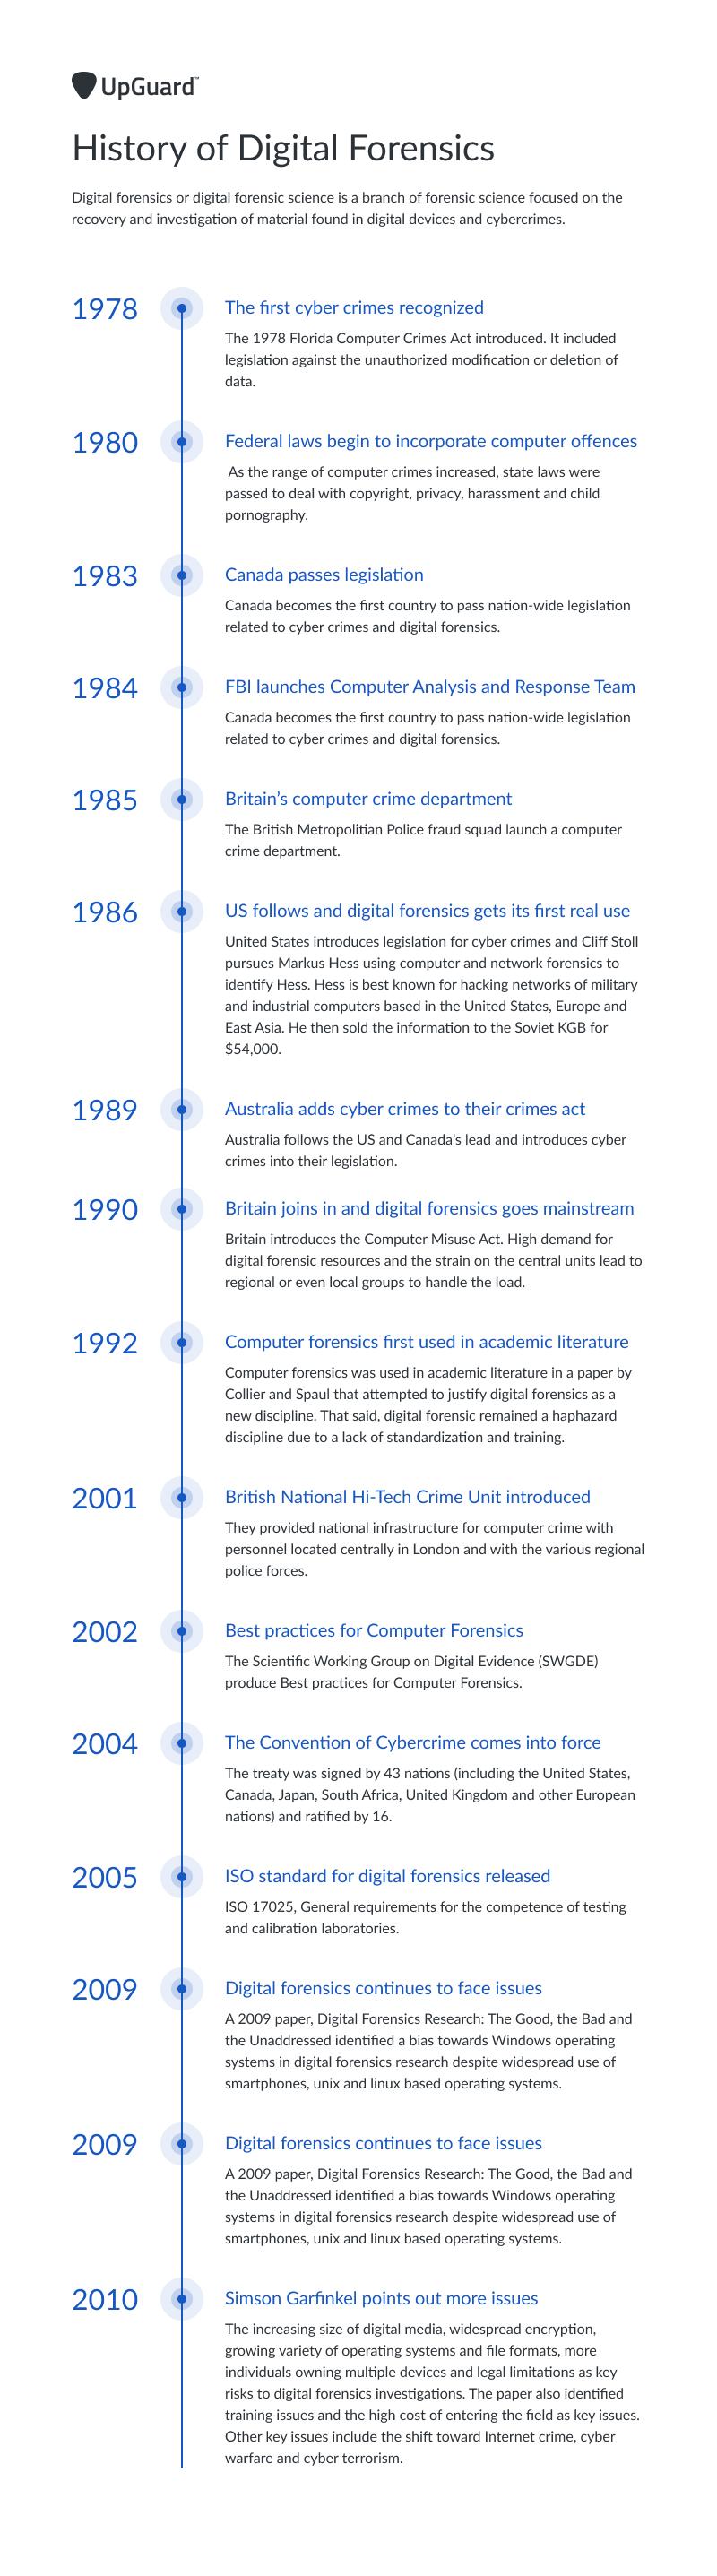 History of Digital Forensics